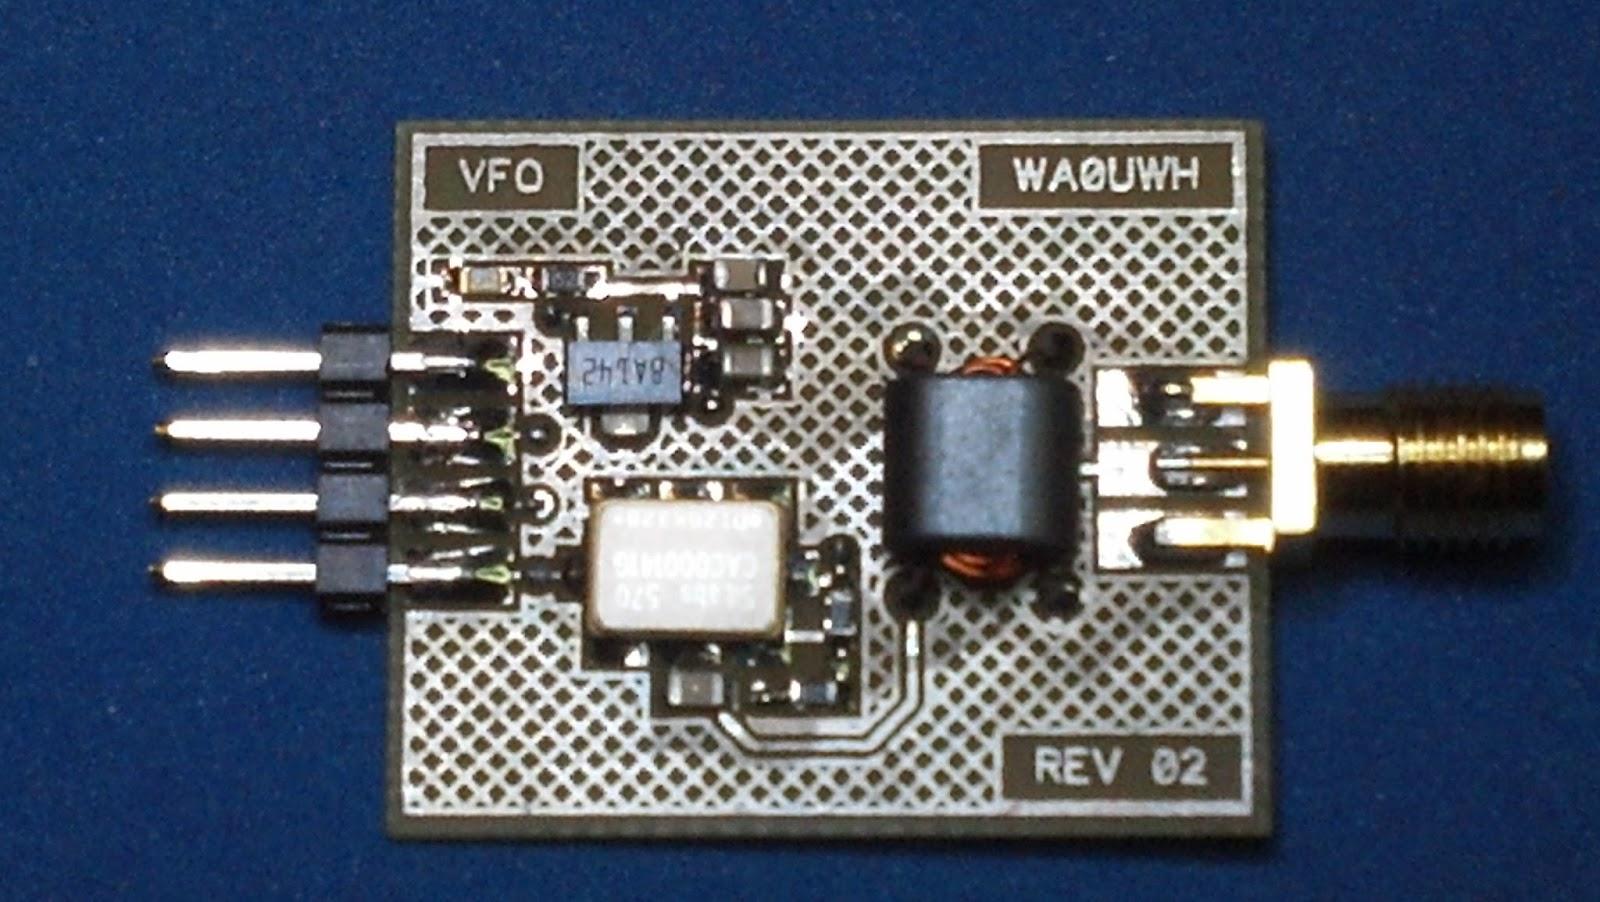 WA0UWH - Electronics & HAM Radio Blog: May 2014